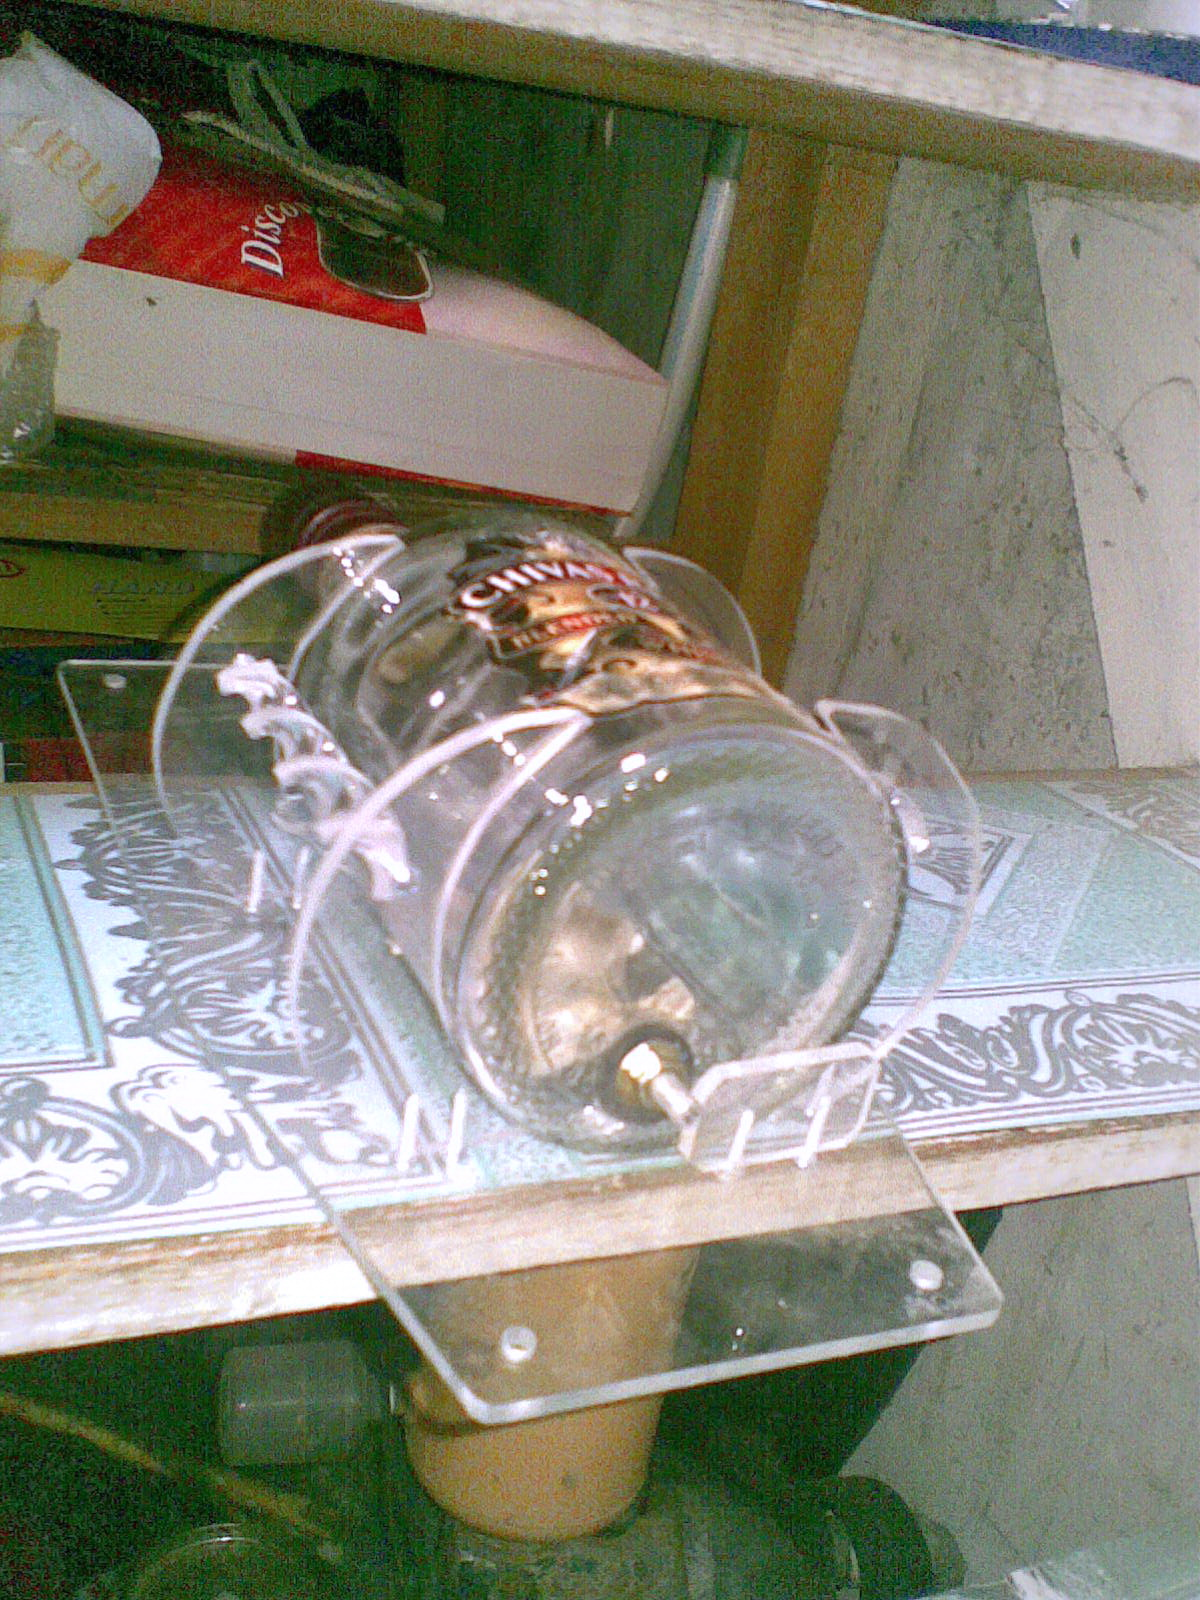 Aksesoris Rx King  Botol Oli Samping Merk Chivas Regal